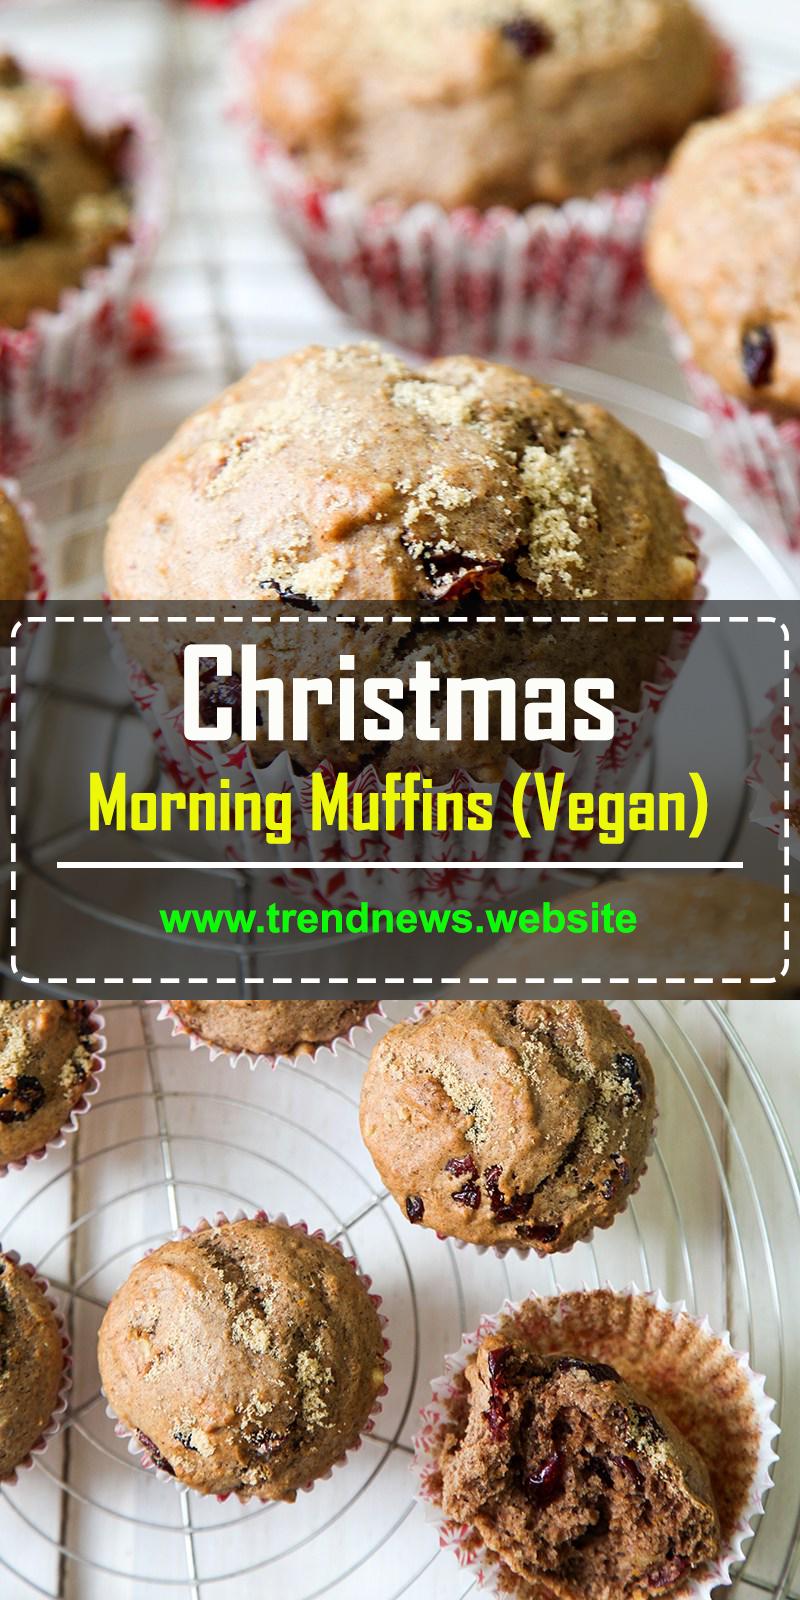 Christmas Morning Muffins (Vegan)